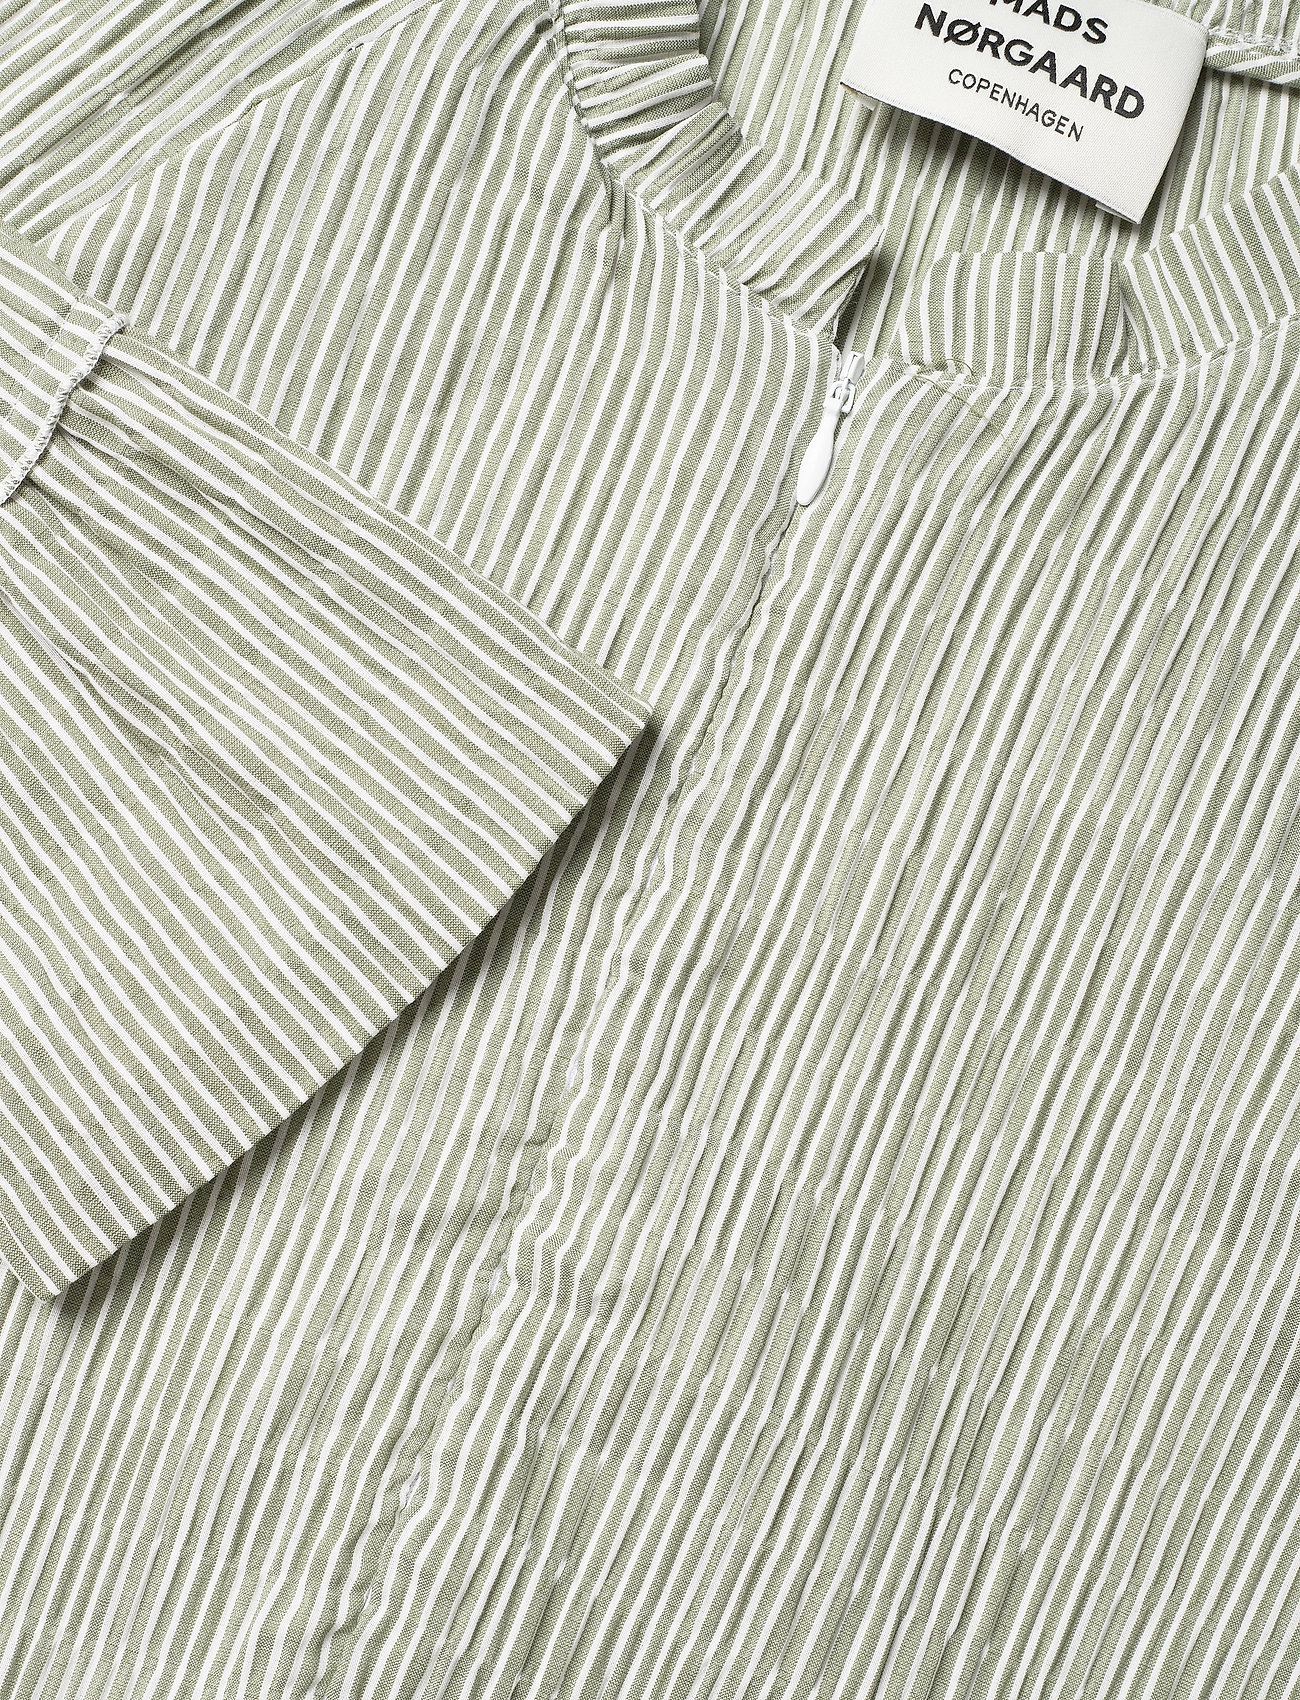 Crinckle Pop Dupina (Army/white) (139 €) - Mads Nørgaard IDVMz